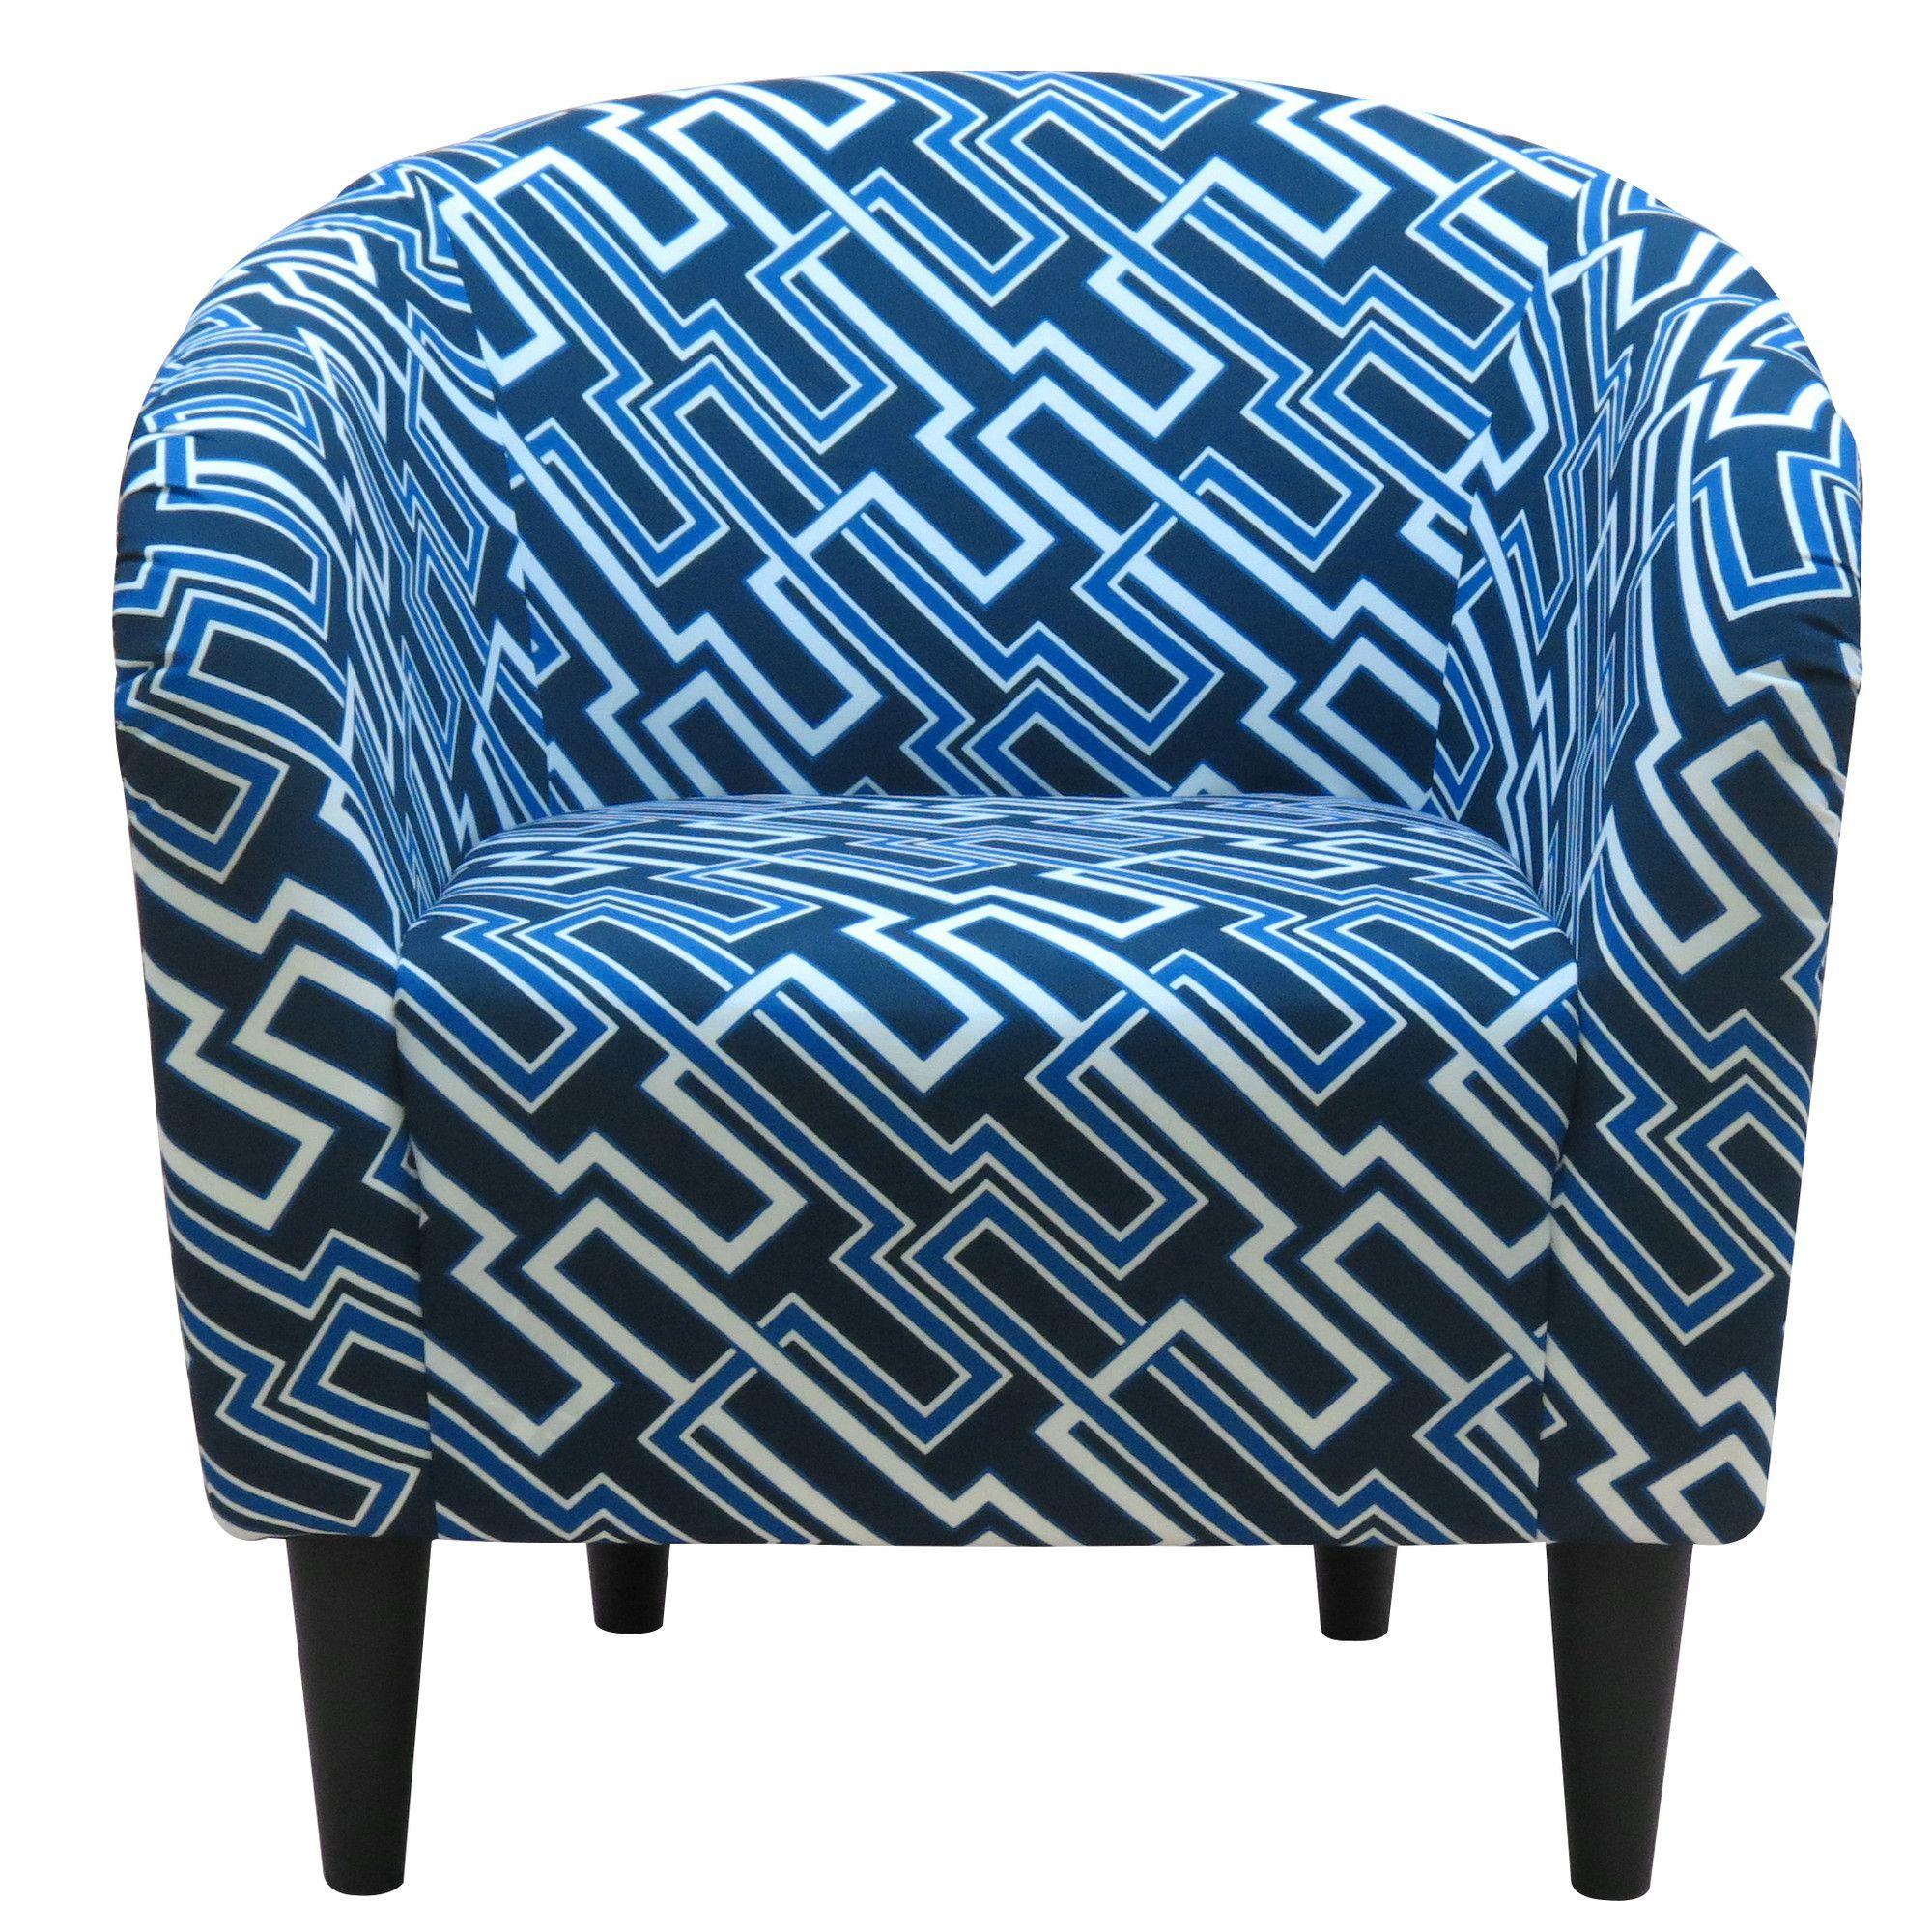 Lilian Premier Jasper Club Chair